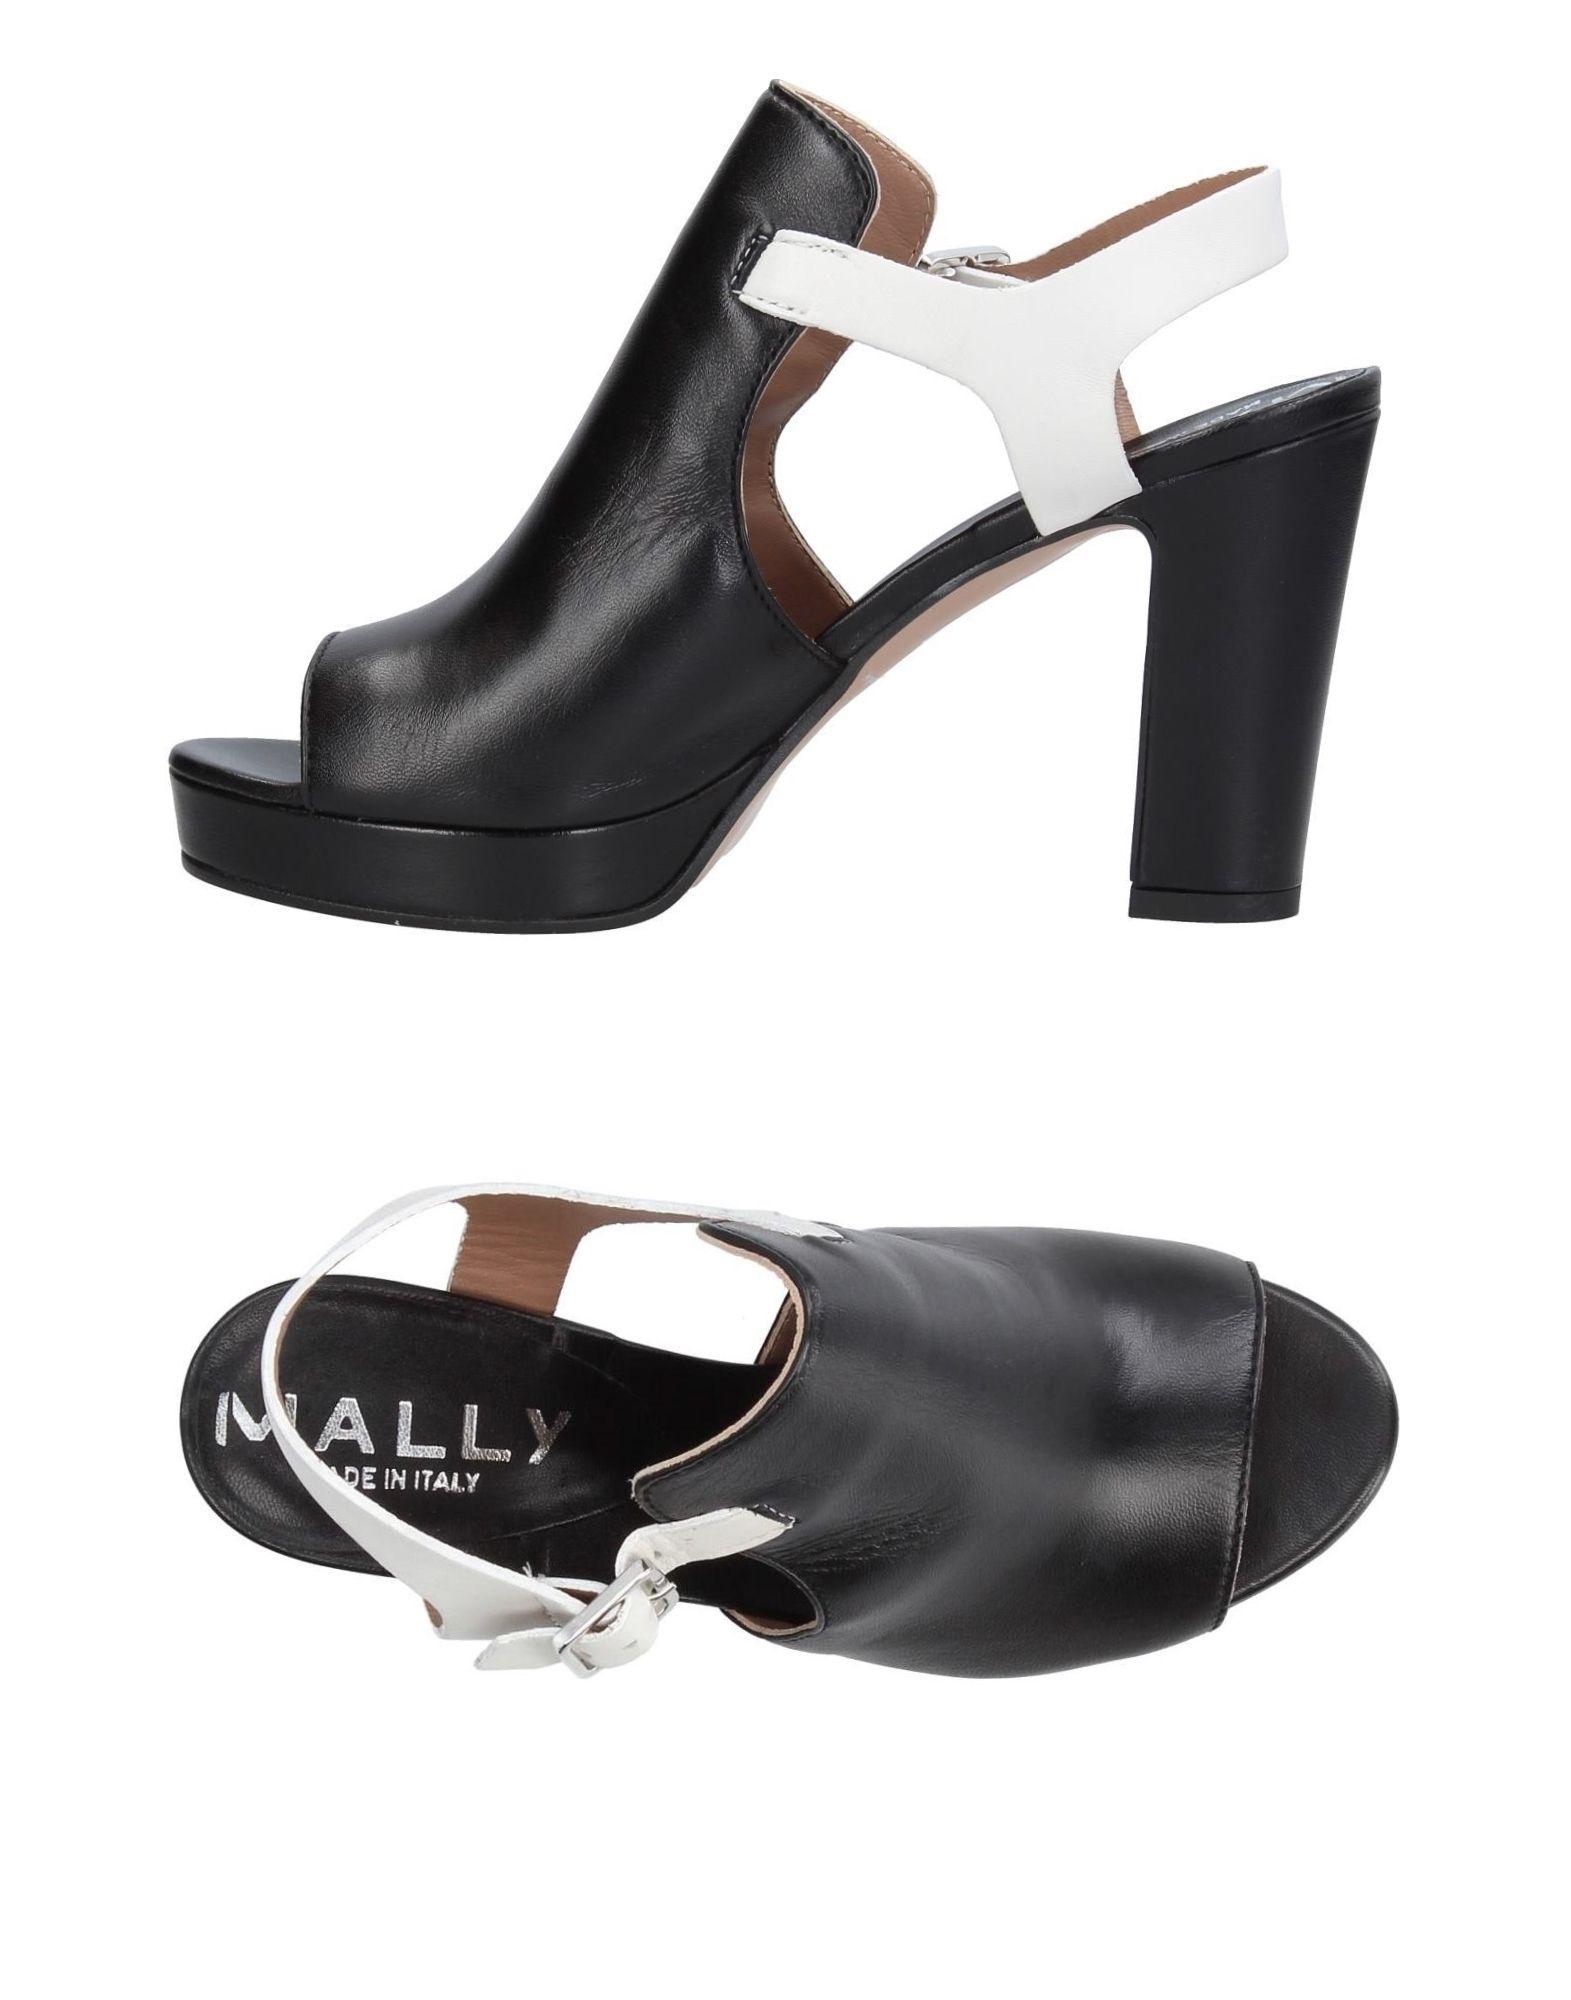 A buon mercato Sandali Mally Donna - 11375852TW